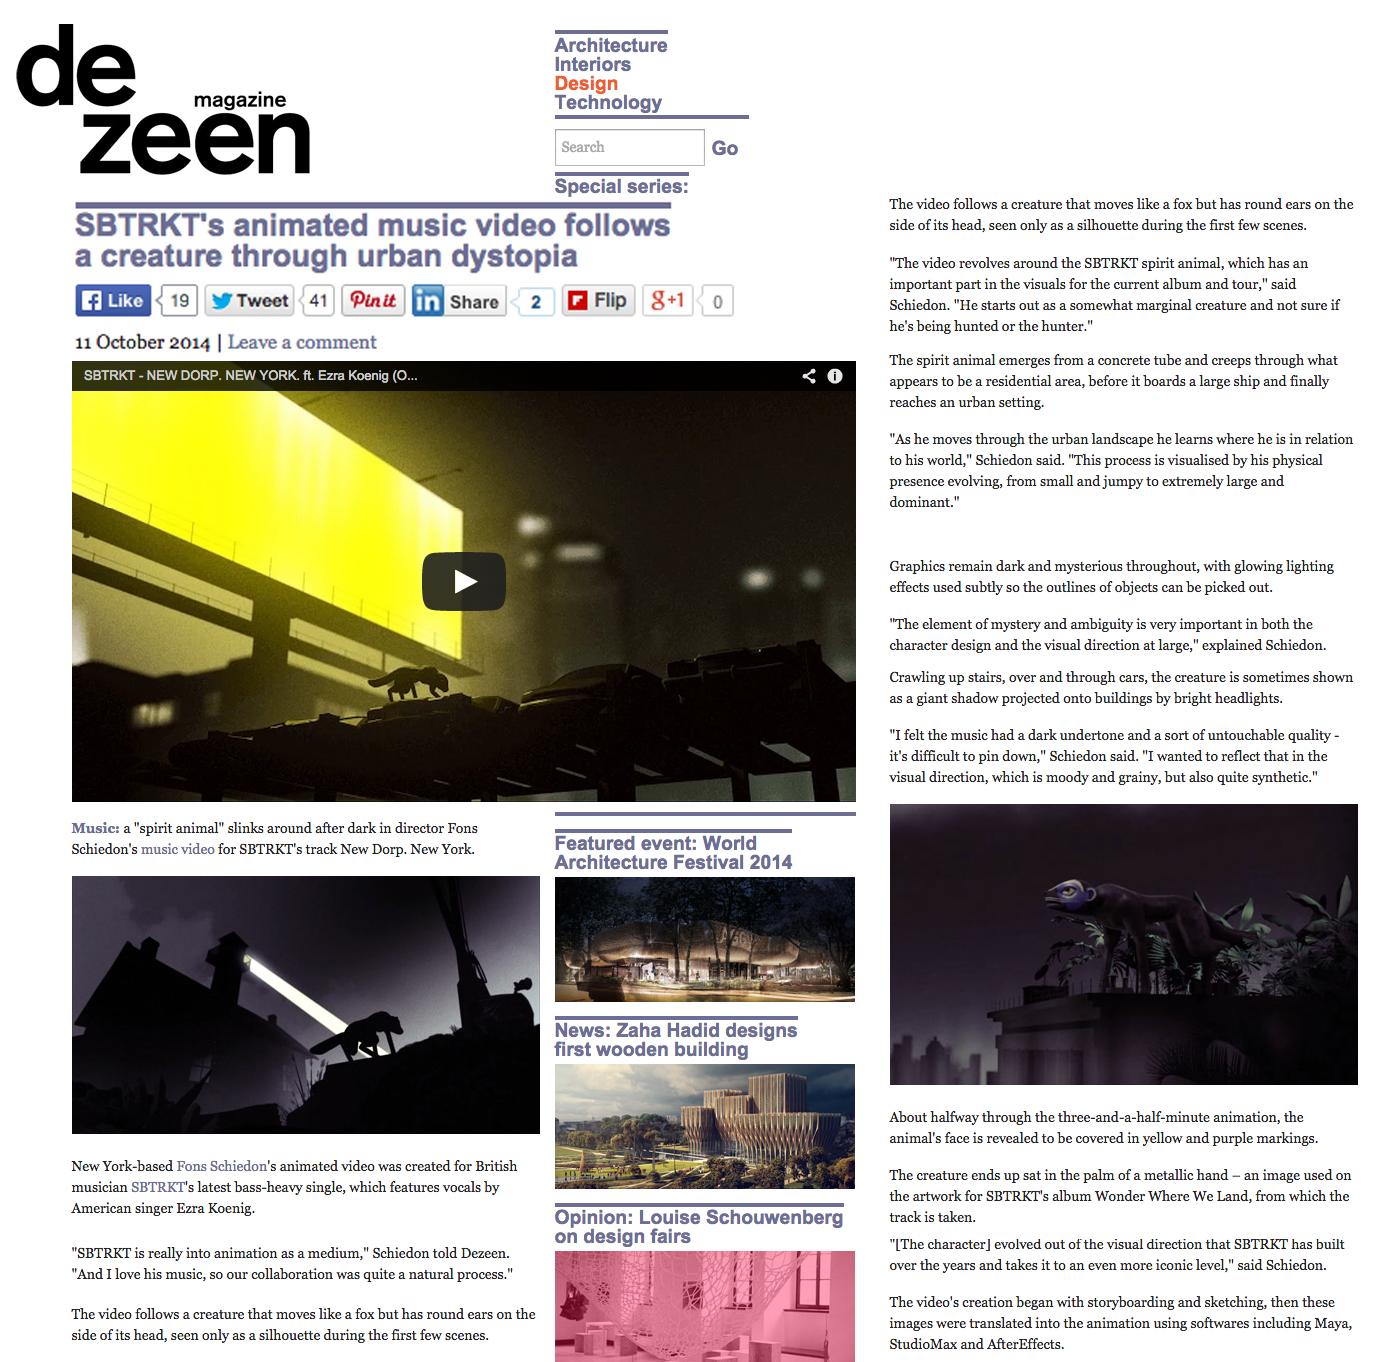 Dezeen_SBTRKT-s-music-video-follows-a-creature-through-urban-distopia.png